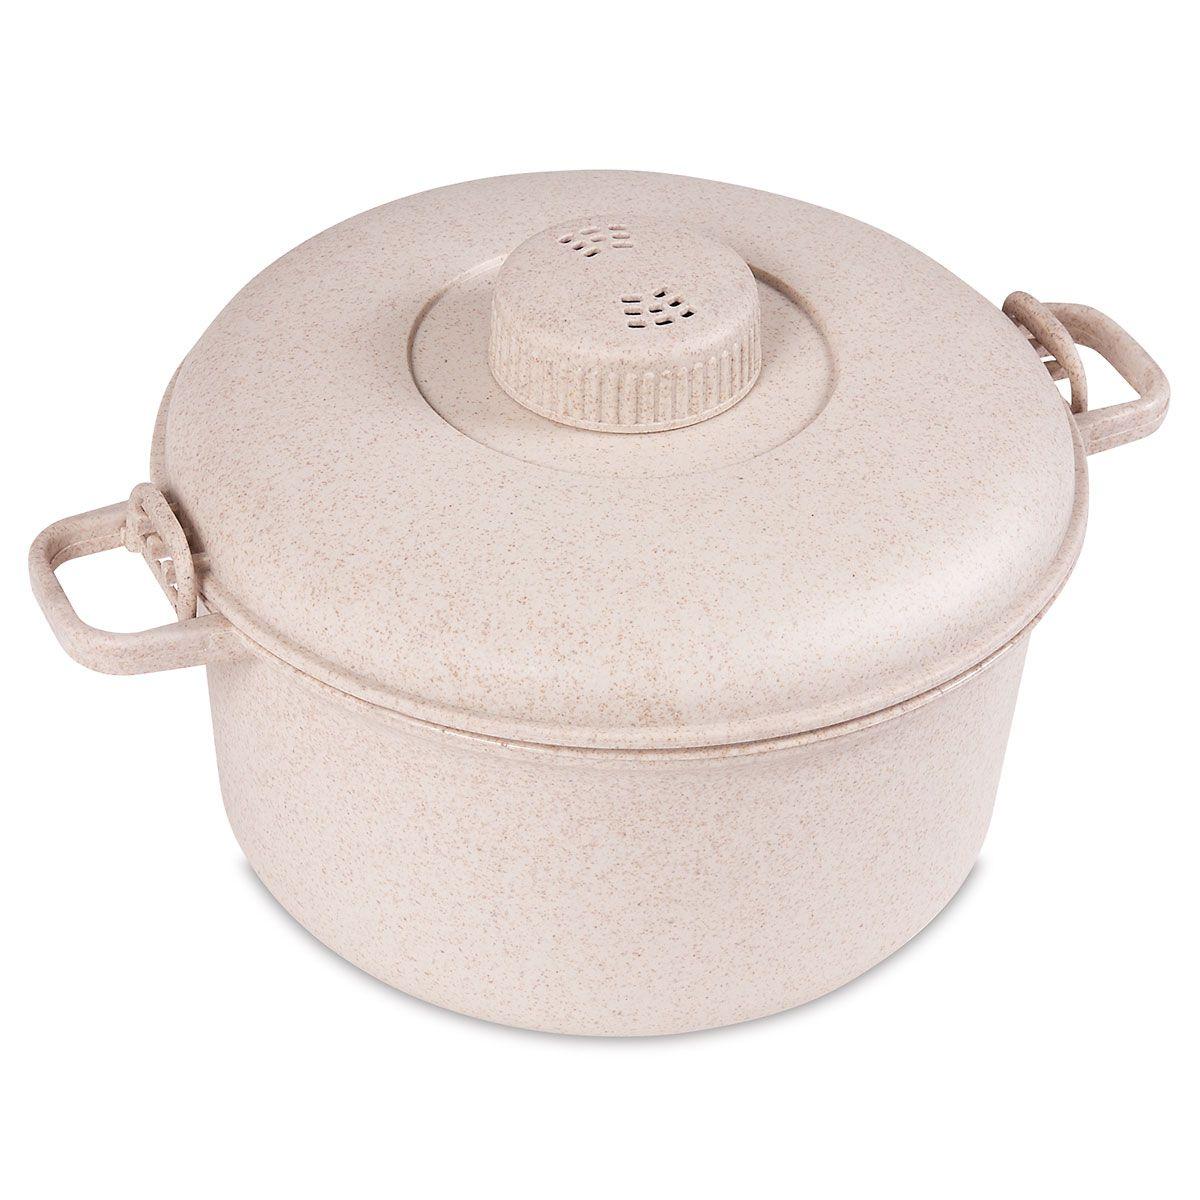 Microwave 2 1/2-Quart Pressure Cooker